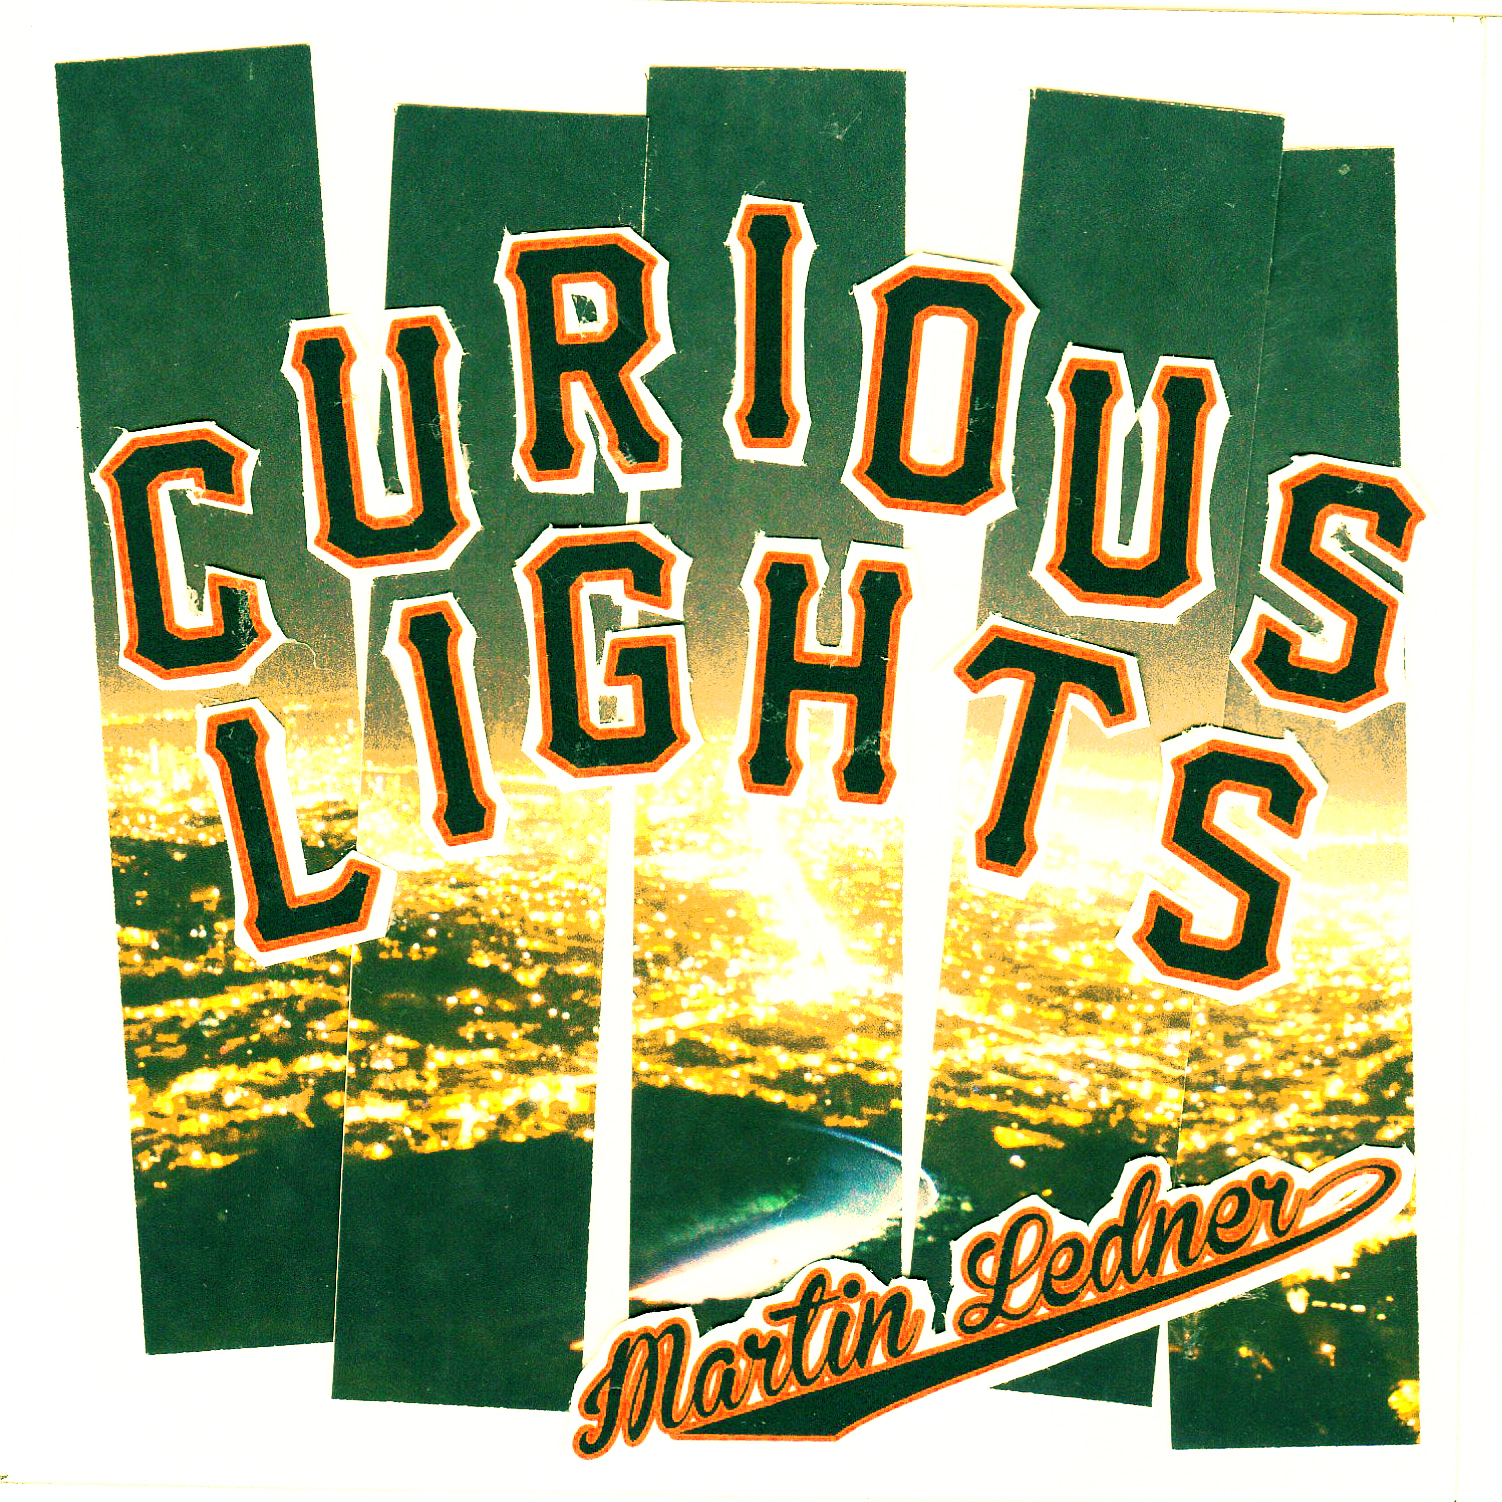 CURIOUS LIGHTS